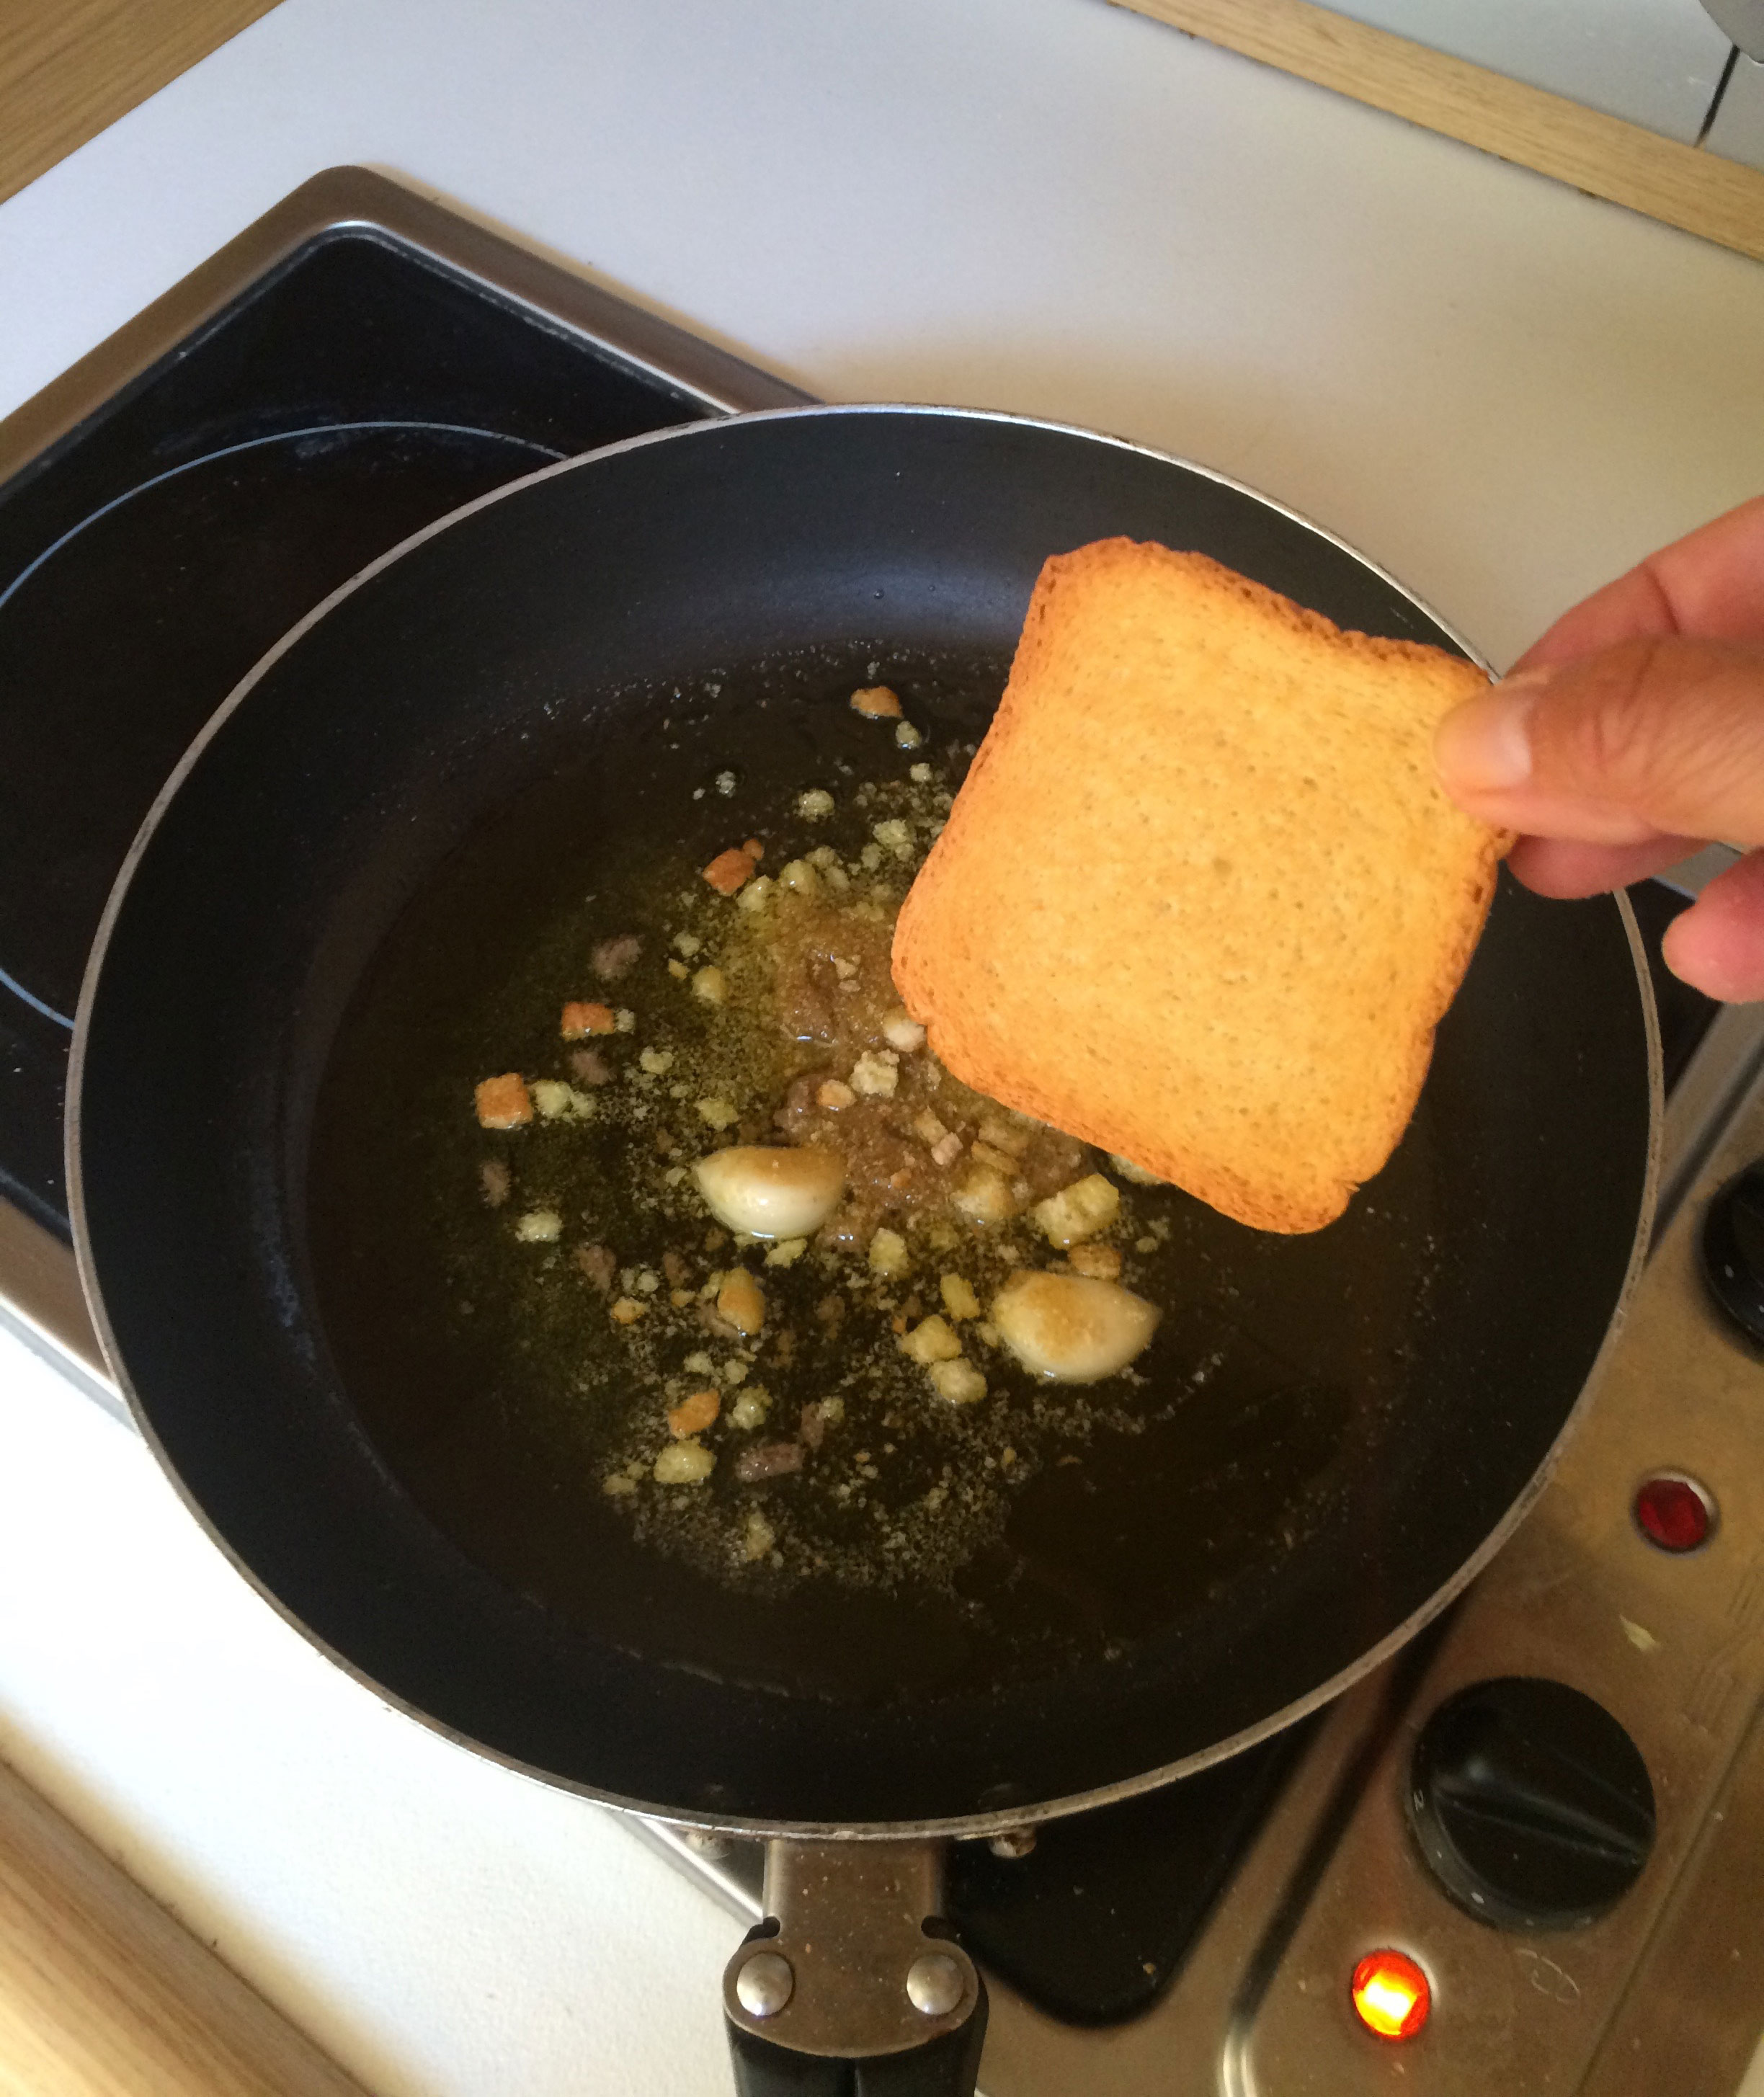 preparazione_zucchine-bottarga02_web